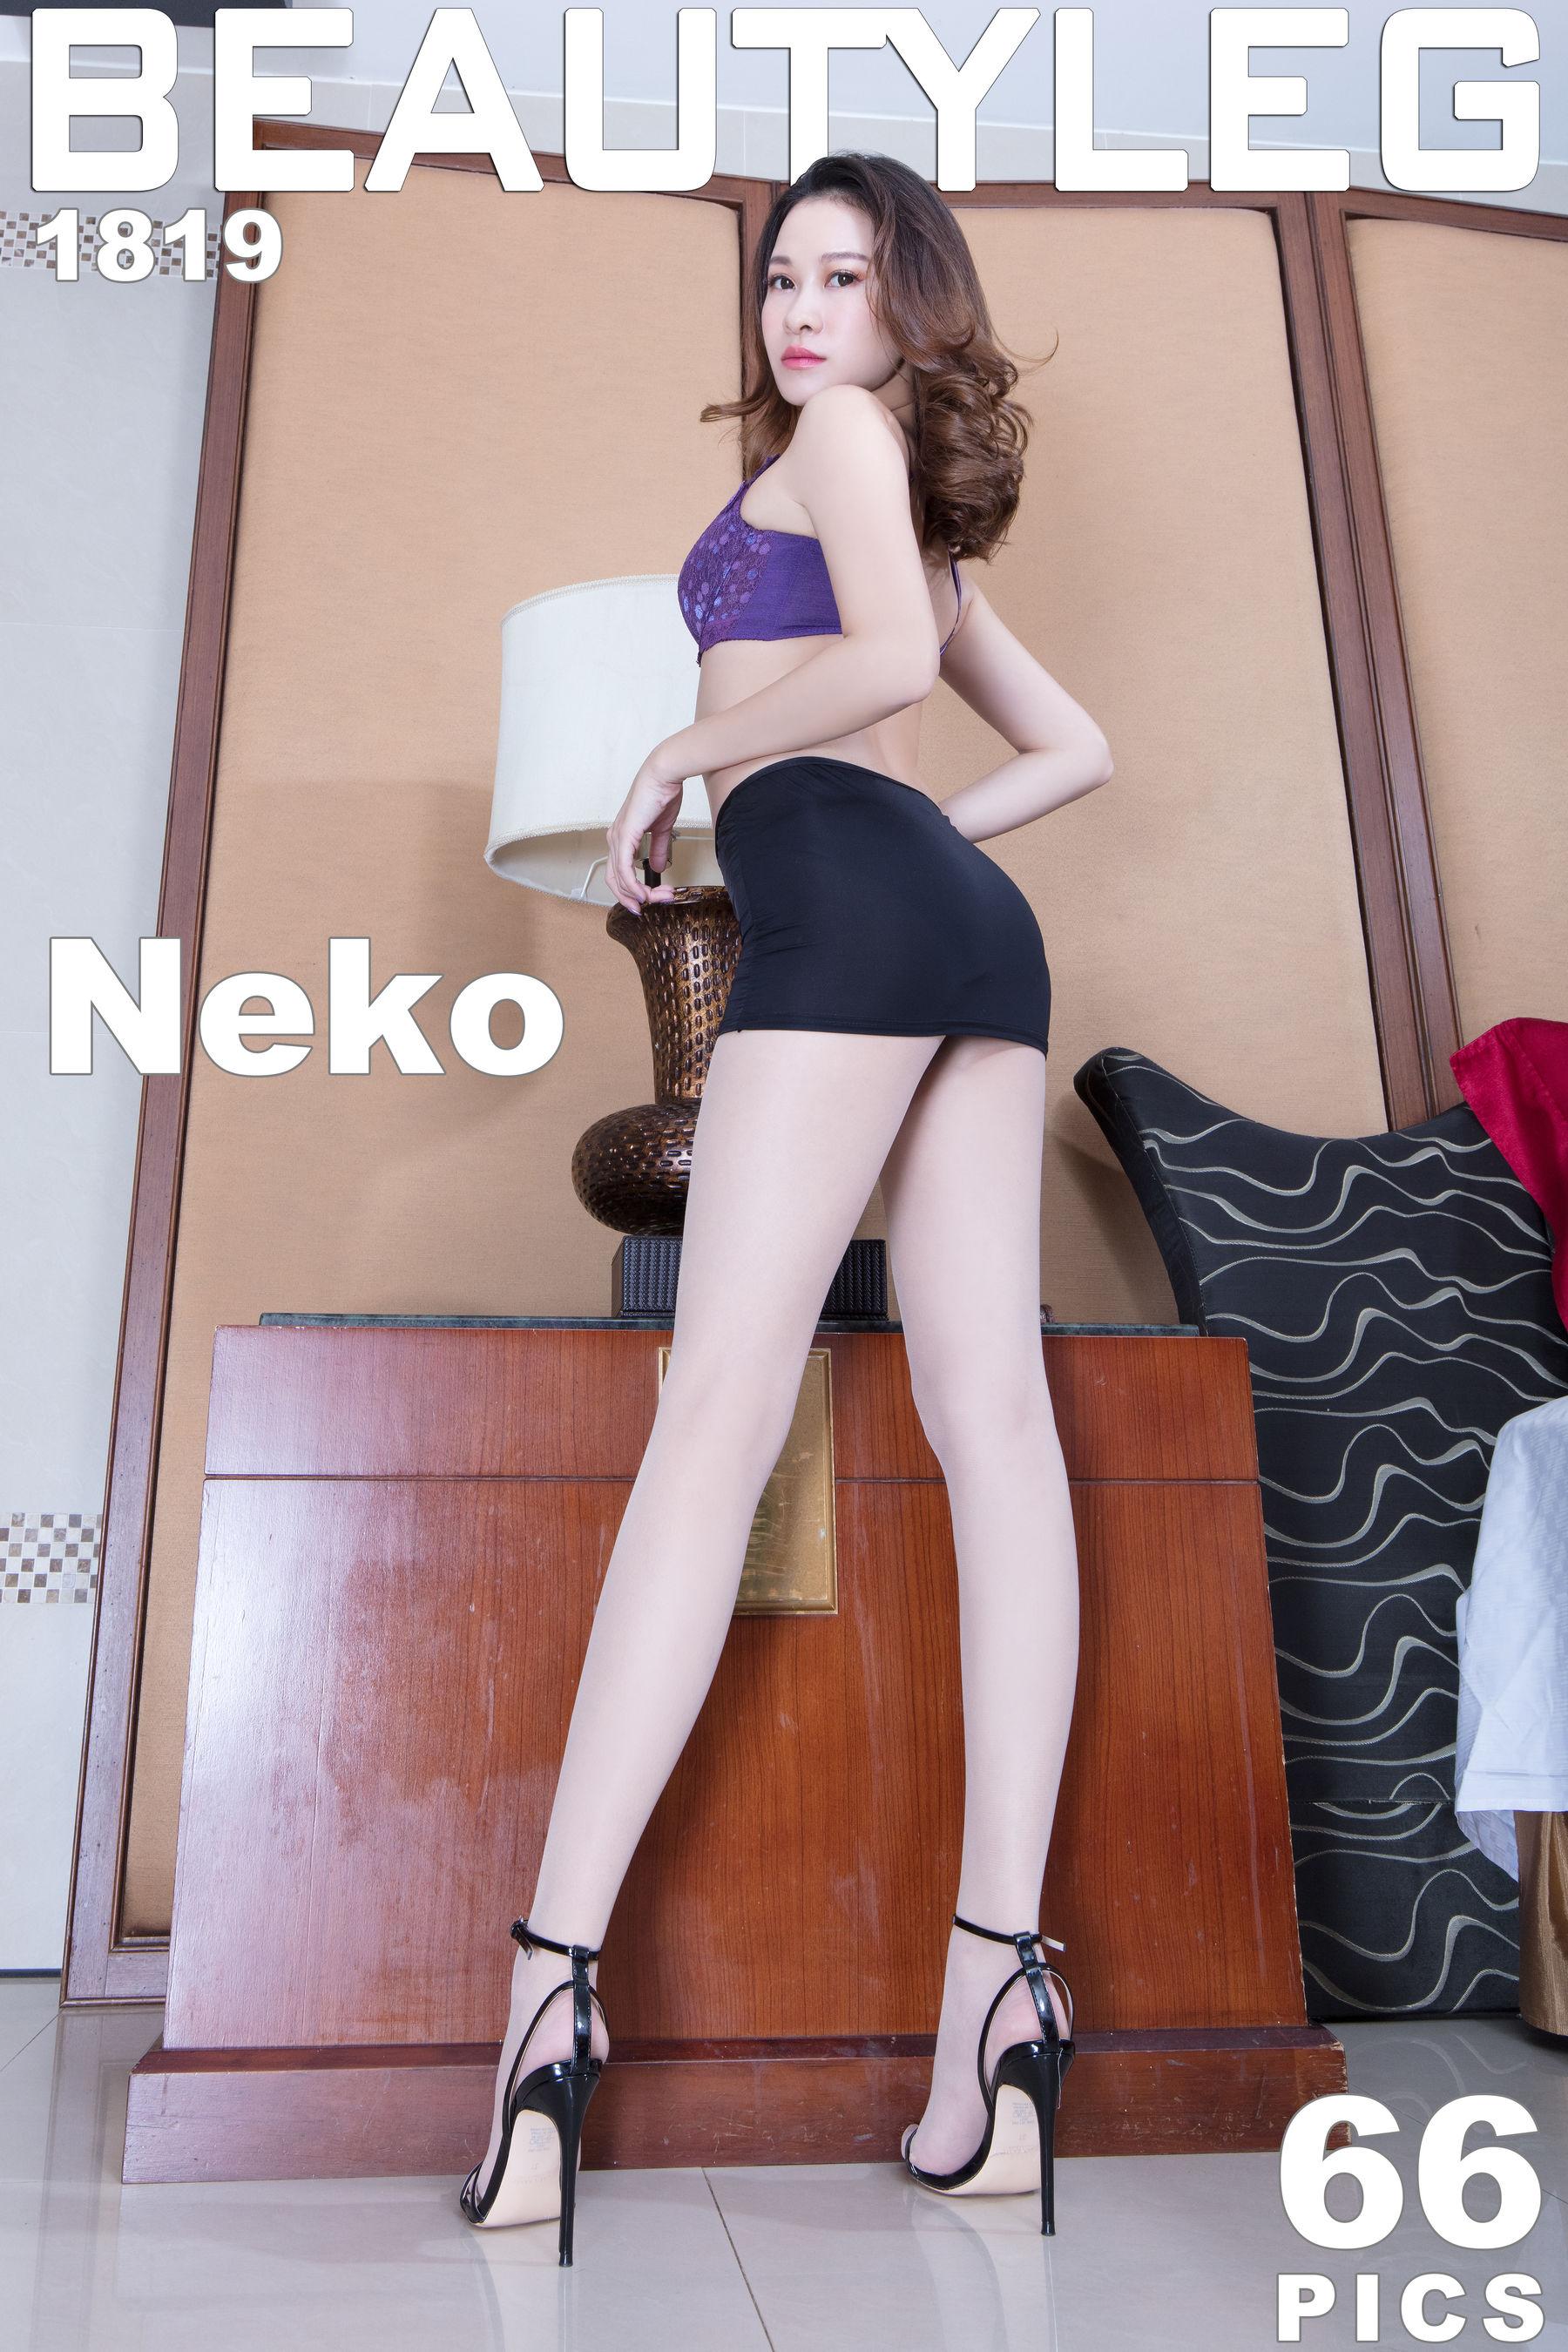 VOL.1366 [Beautyleg]高跟肉丝袜长腿美女丝袜制服:黄镫娴(腿模Neko)超高清个人性感漂亮大图(58P)